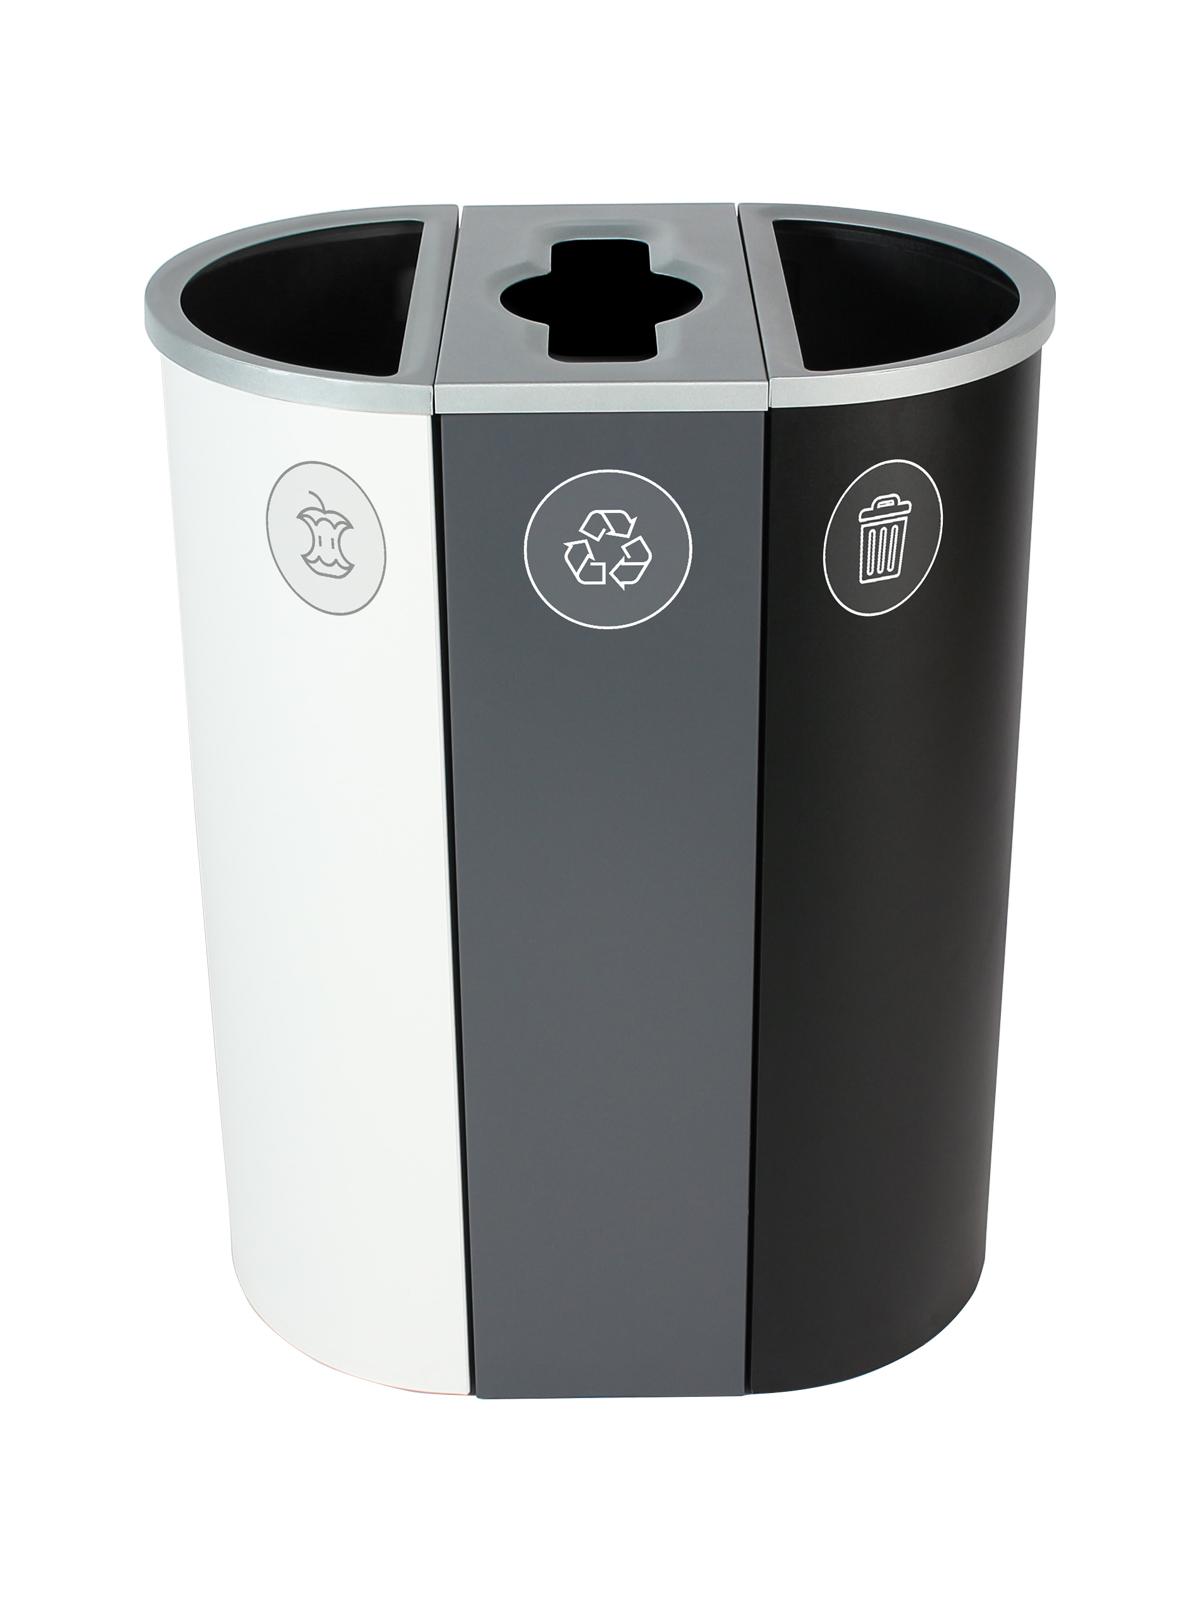 SPECTRUM - Triple - Organics-Mobius Loop-Waste - Full-Mixed-Full - White-Grey-Black